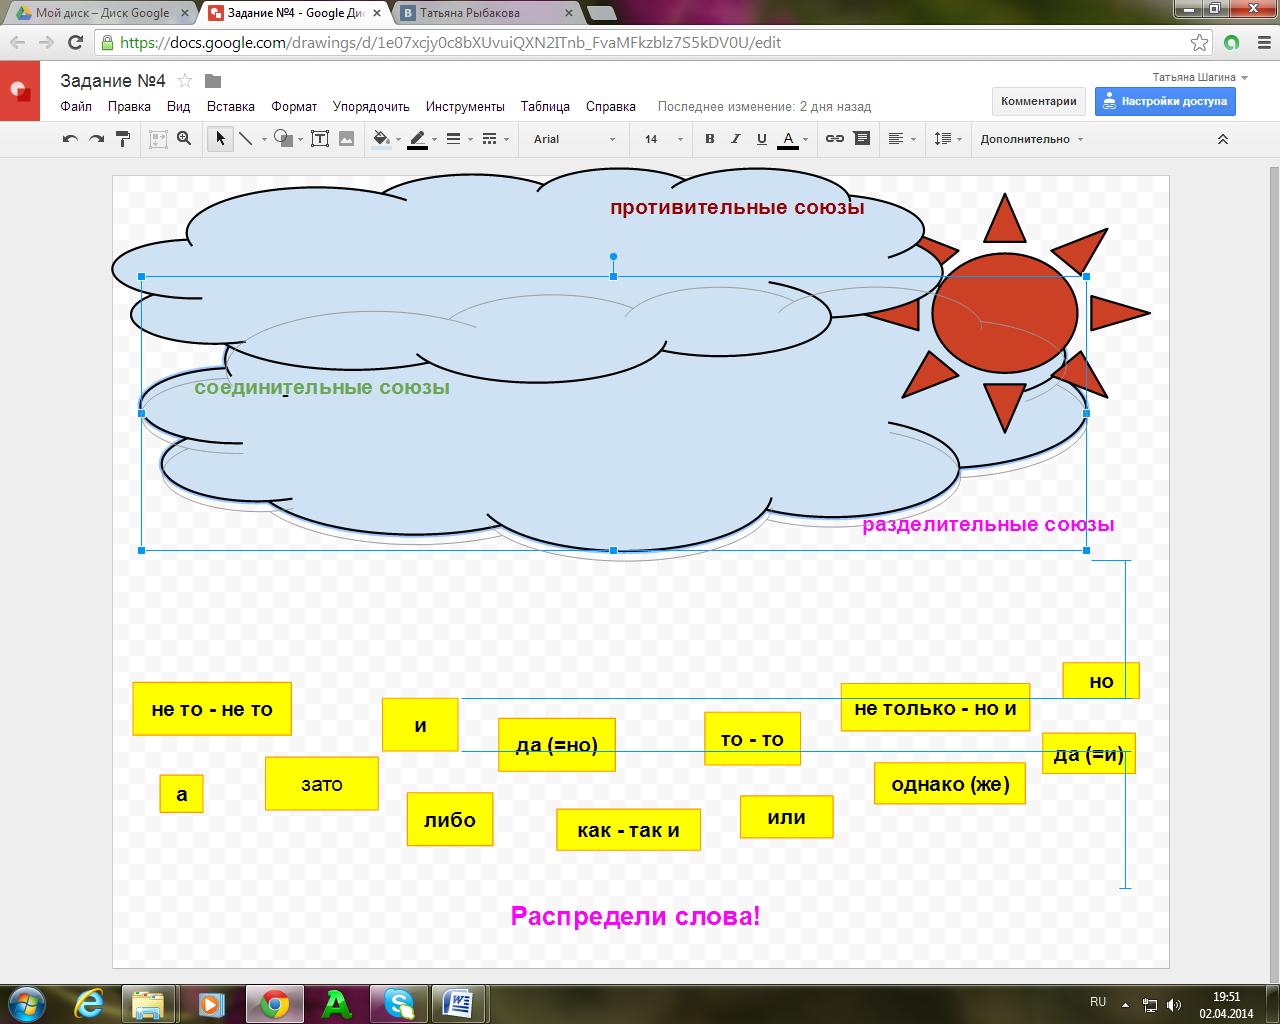 Конспект урока в классе по теме Правописание союзов  hello html mabe58f4 png hello html m38806955 png